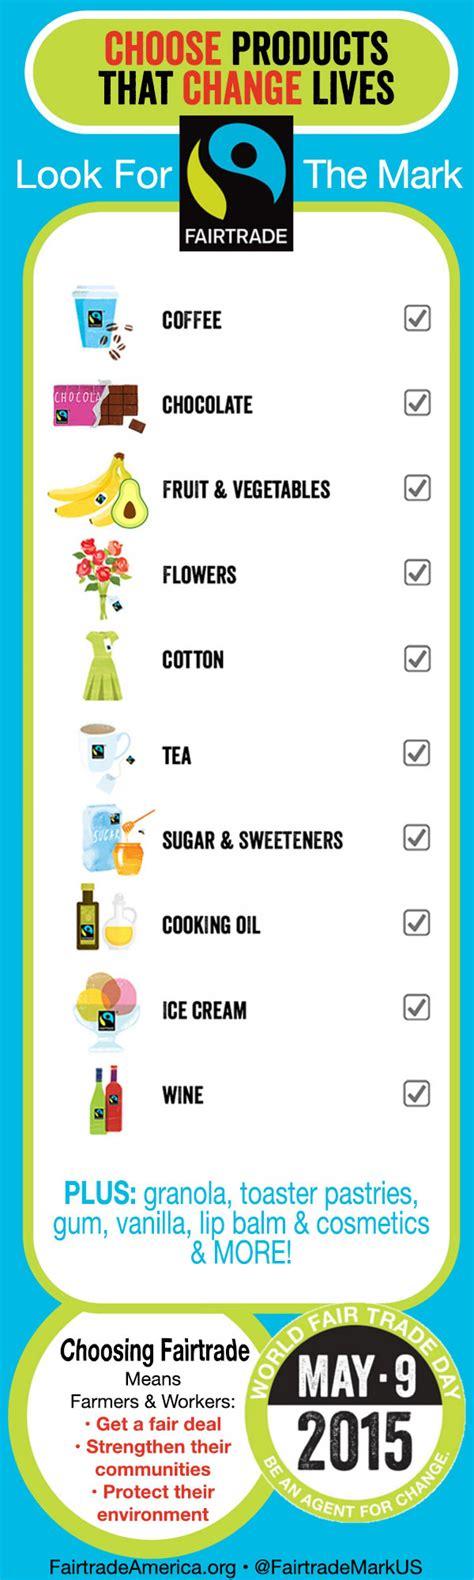 Fairtrade Shopping List | Visual.ly